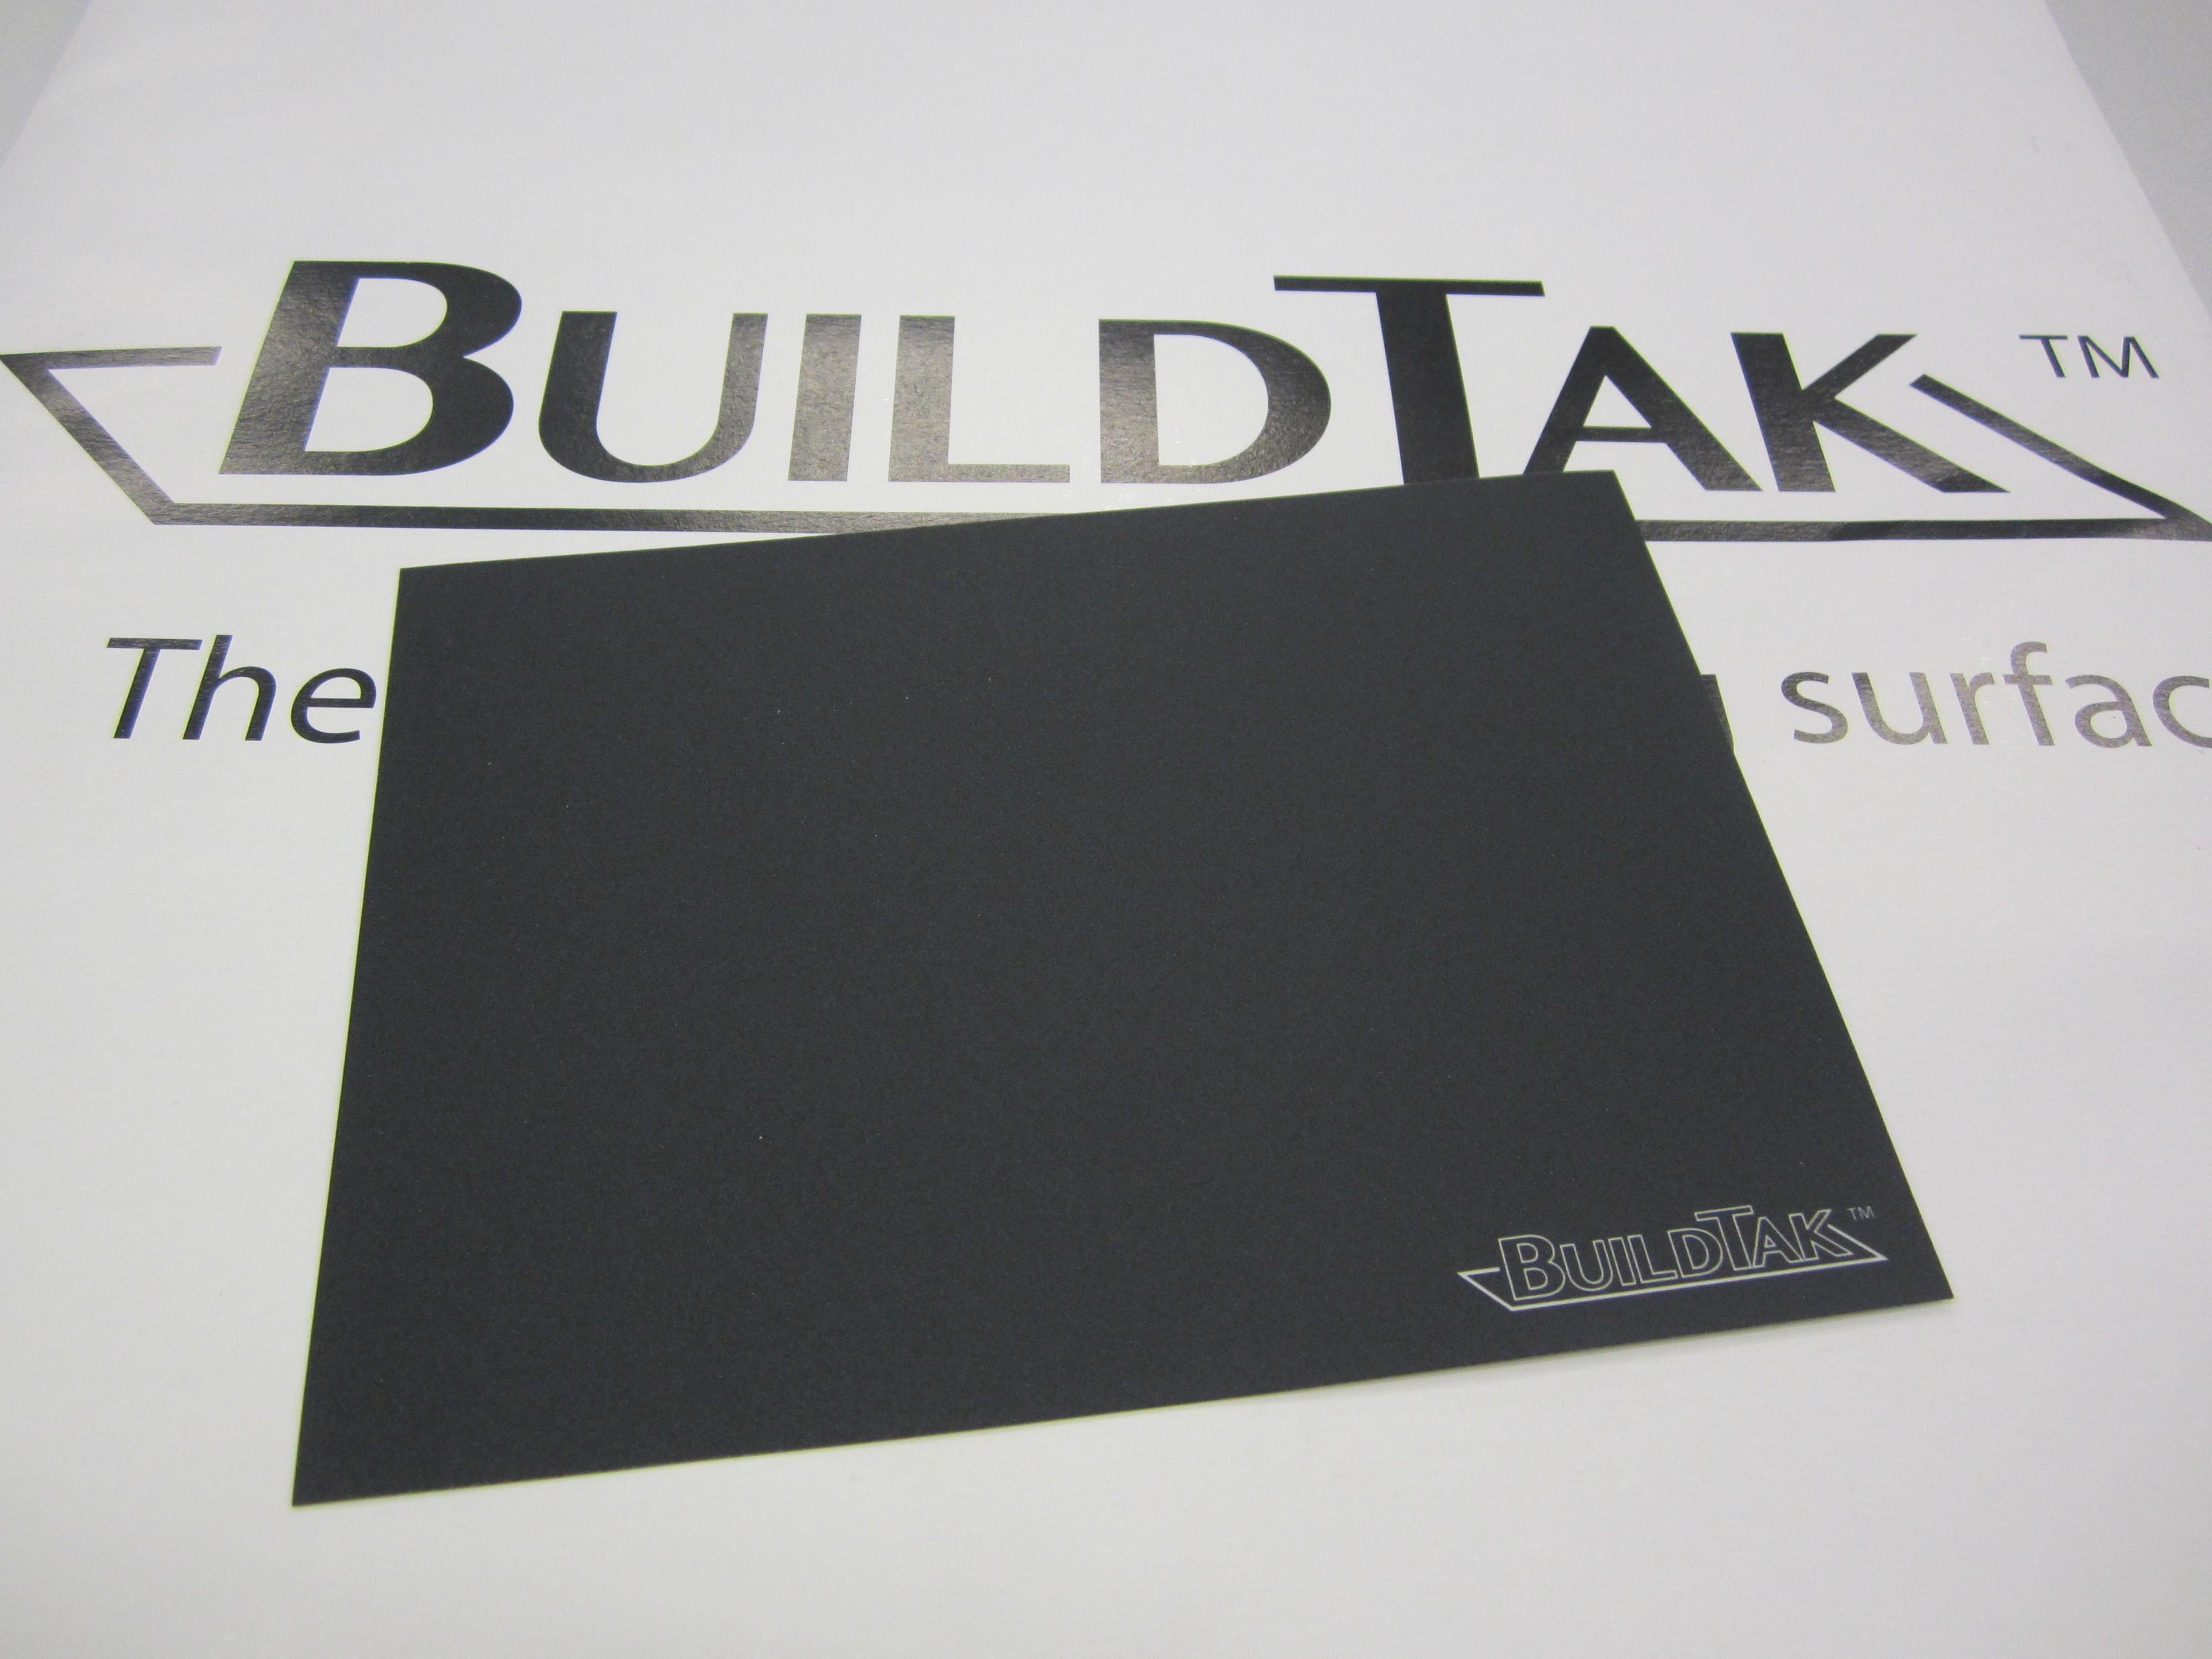 202x148 Buildtak